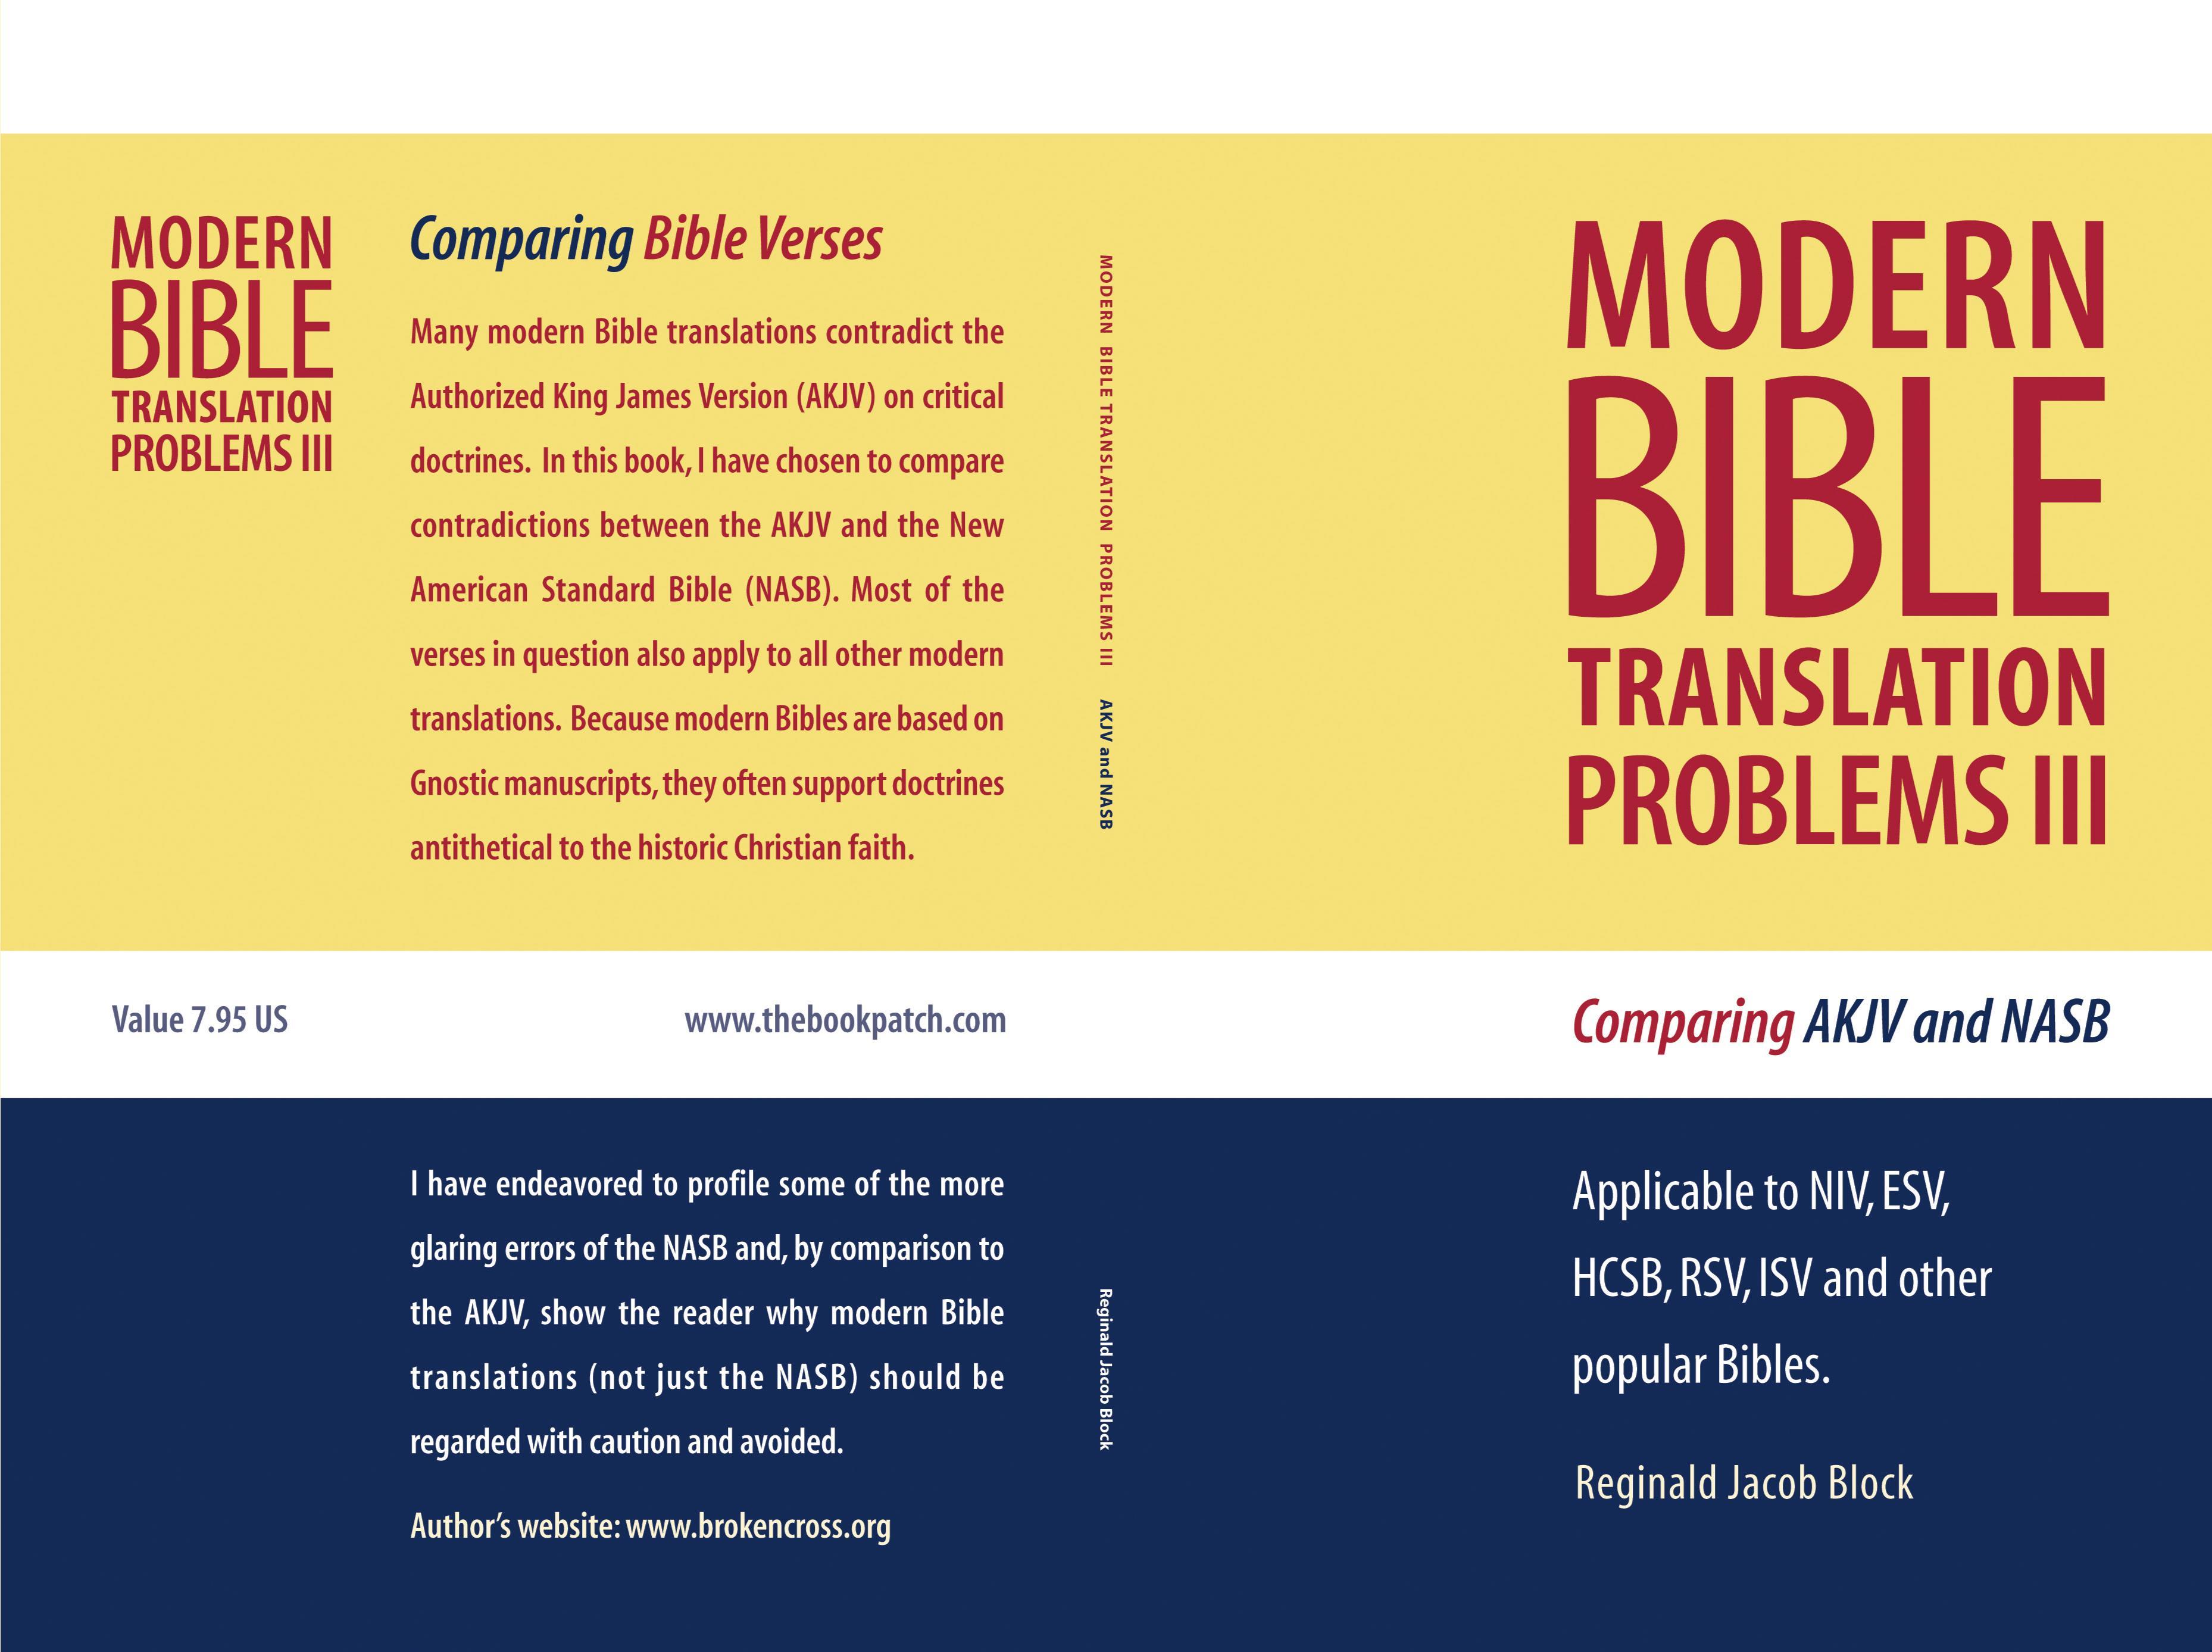 modern bible translation problems iii by reginald jacob